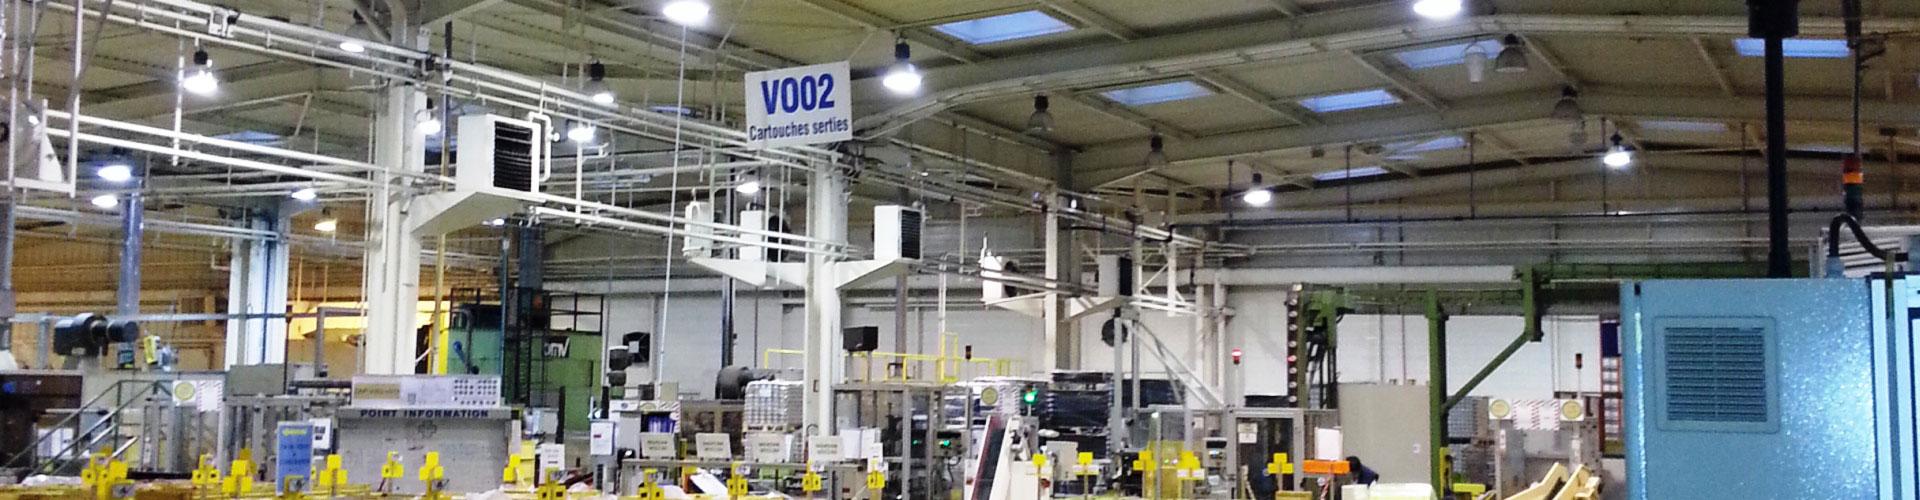 Destratification Fan System Warehouses Slider 4